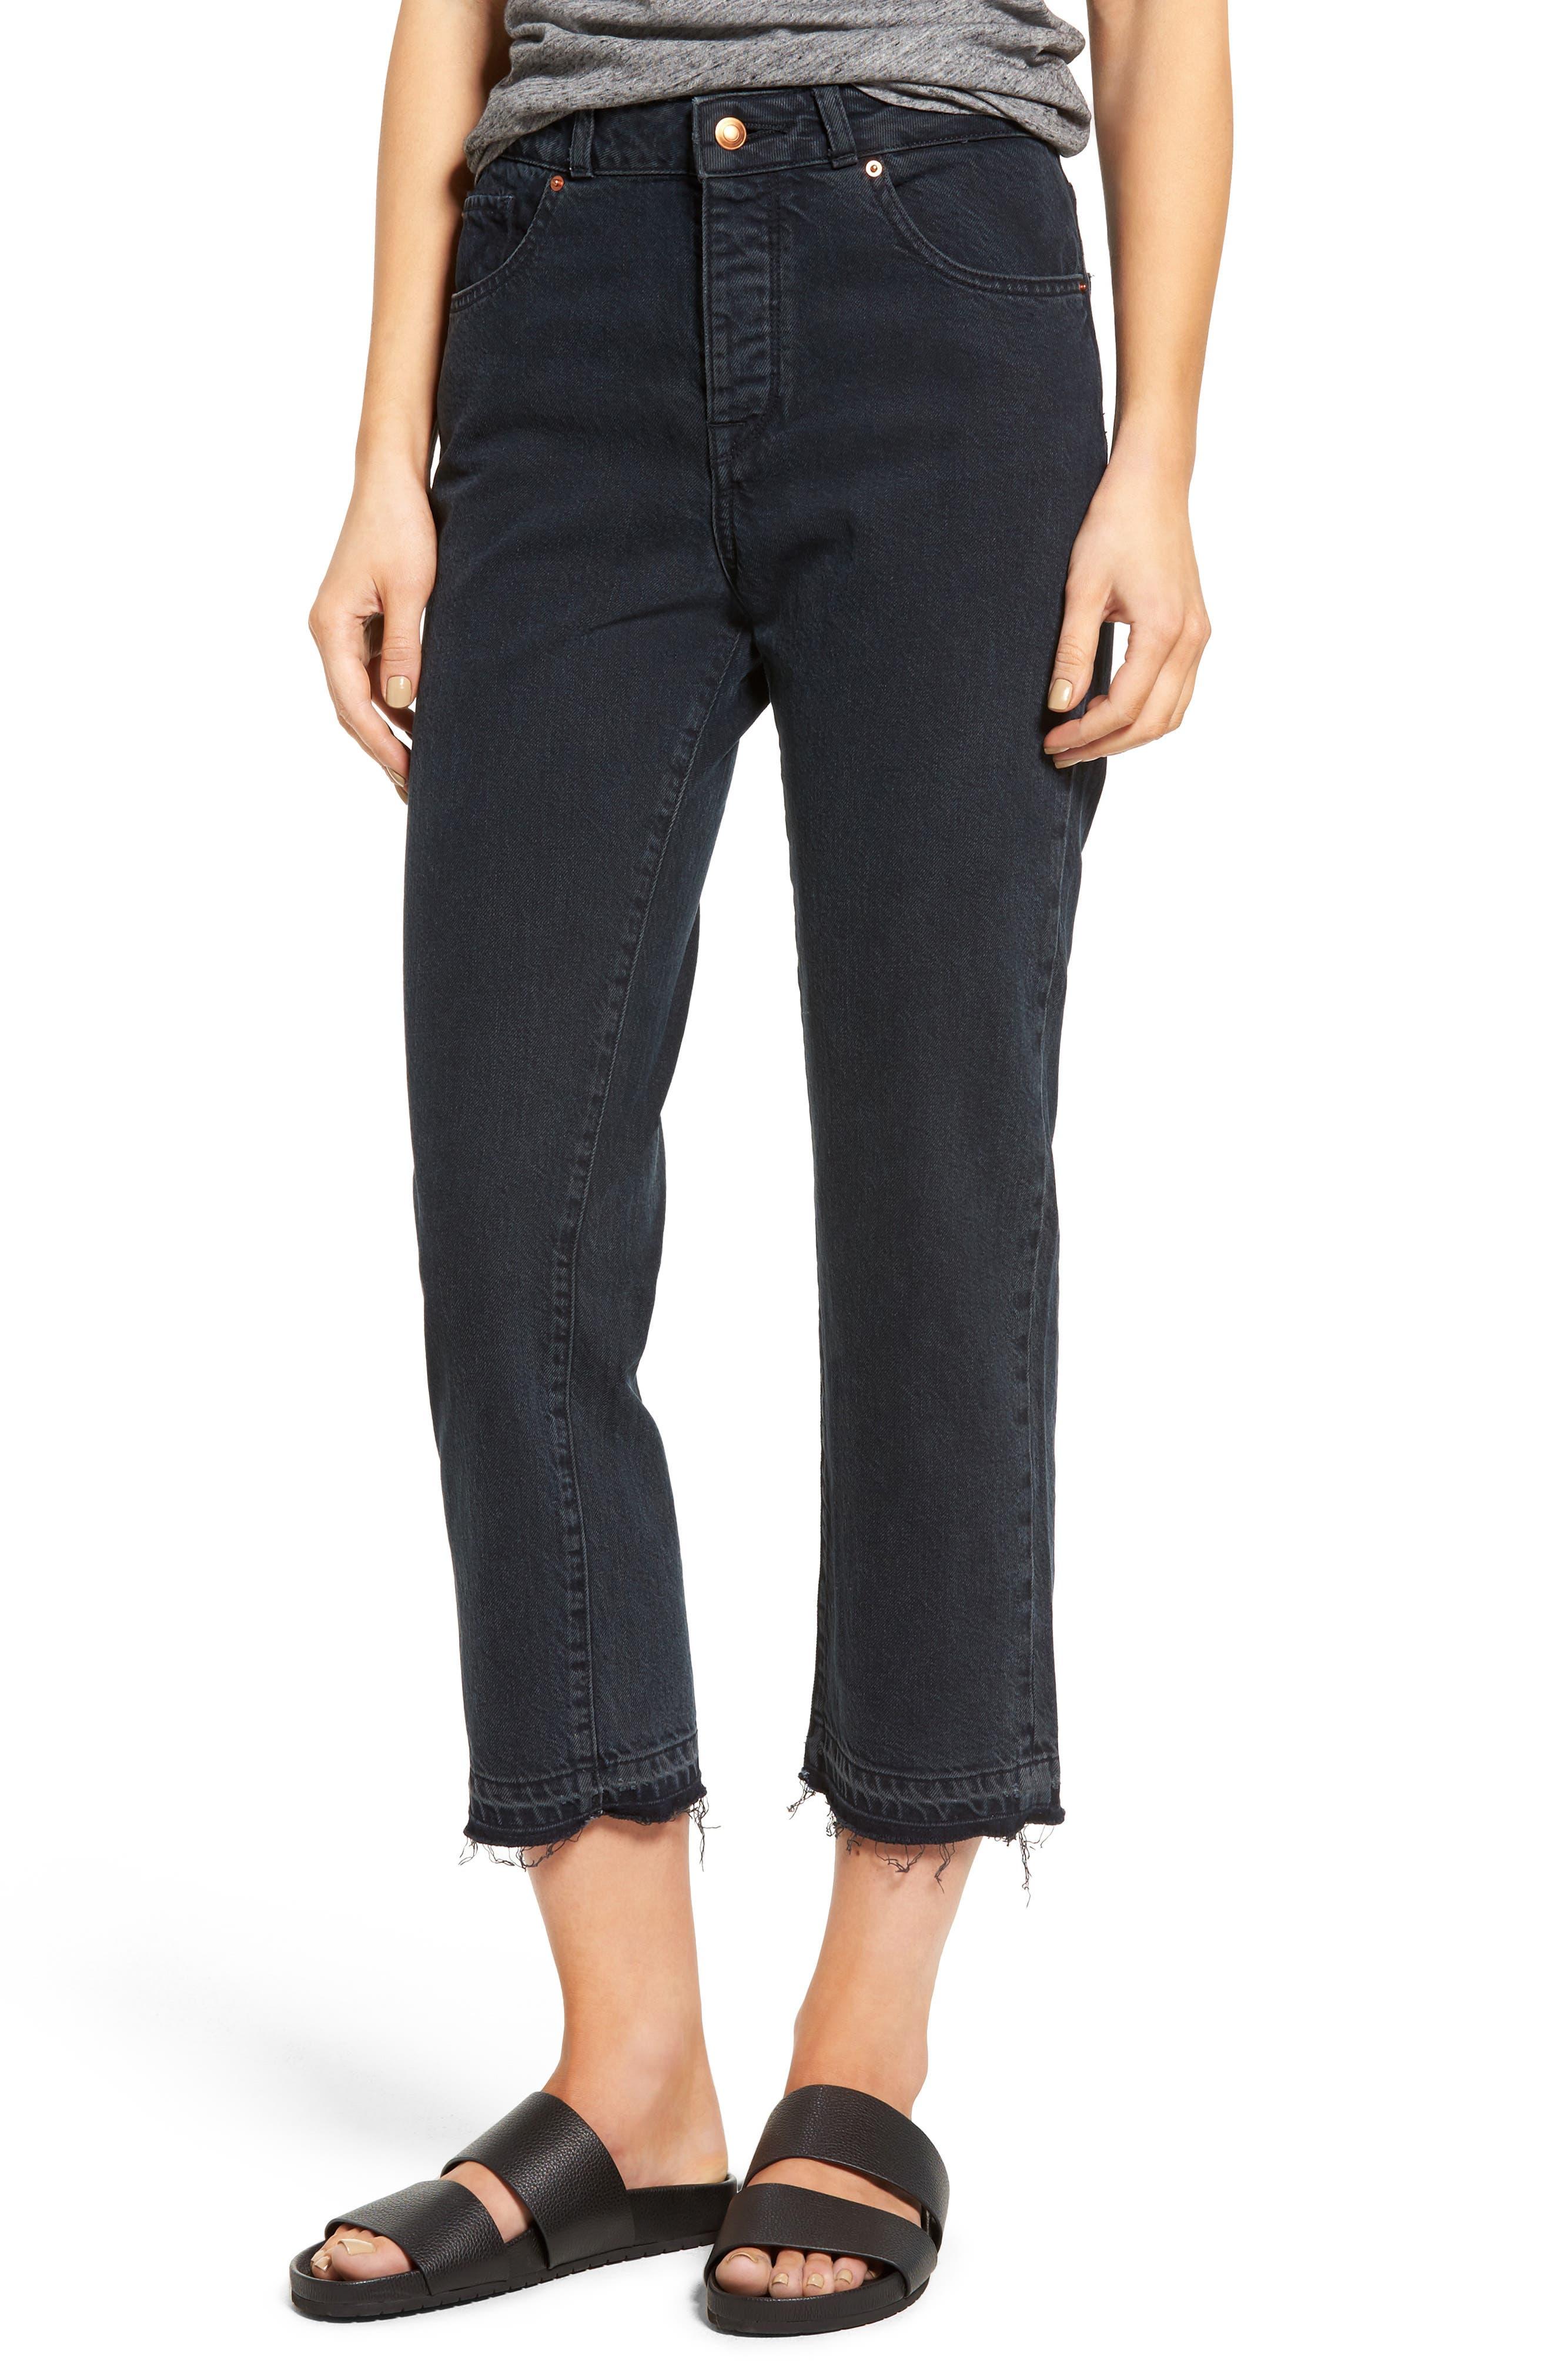 Patti High Rise Straight Leg Jeans,                         Main,                         color, 002